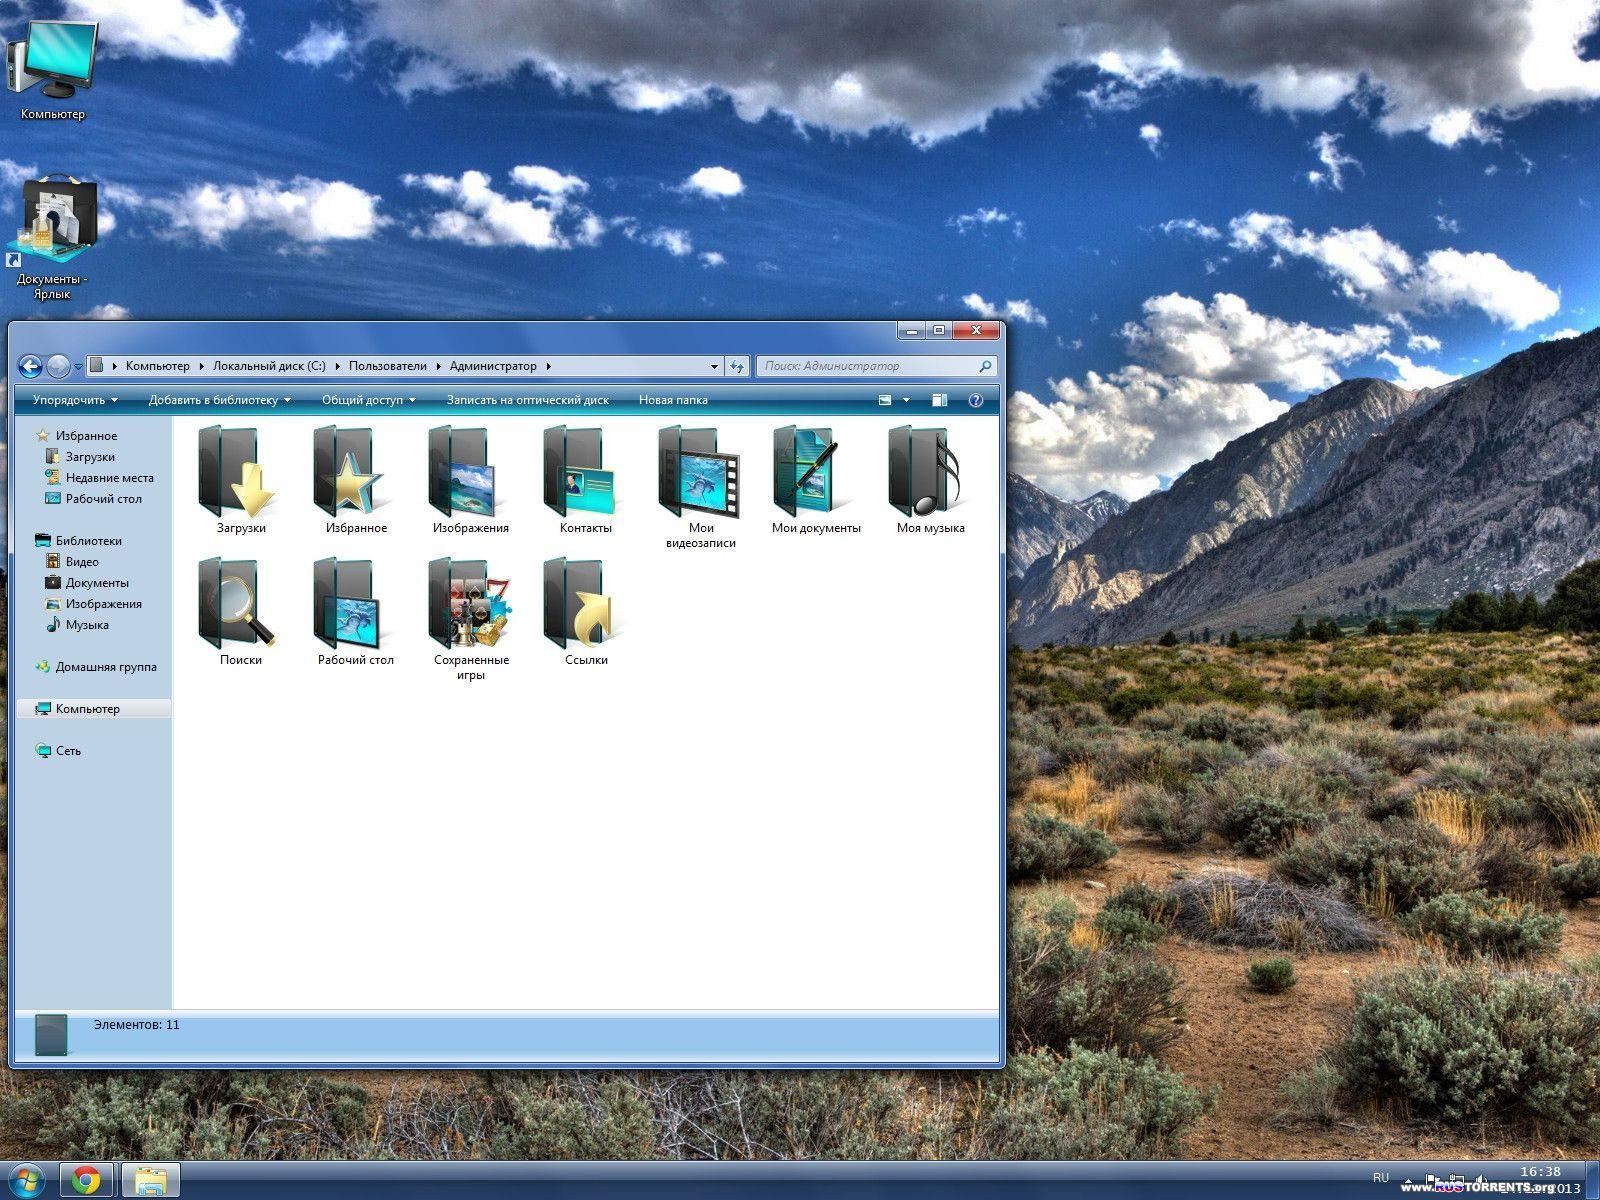 Windows 7 ultimate SP1 x64 IE11 G.M.A. 14.11.13 RUS